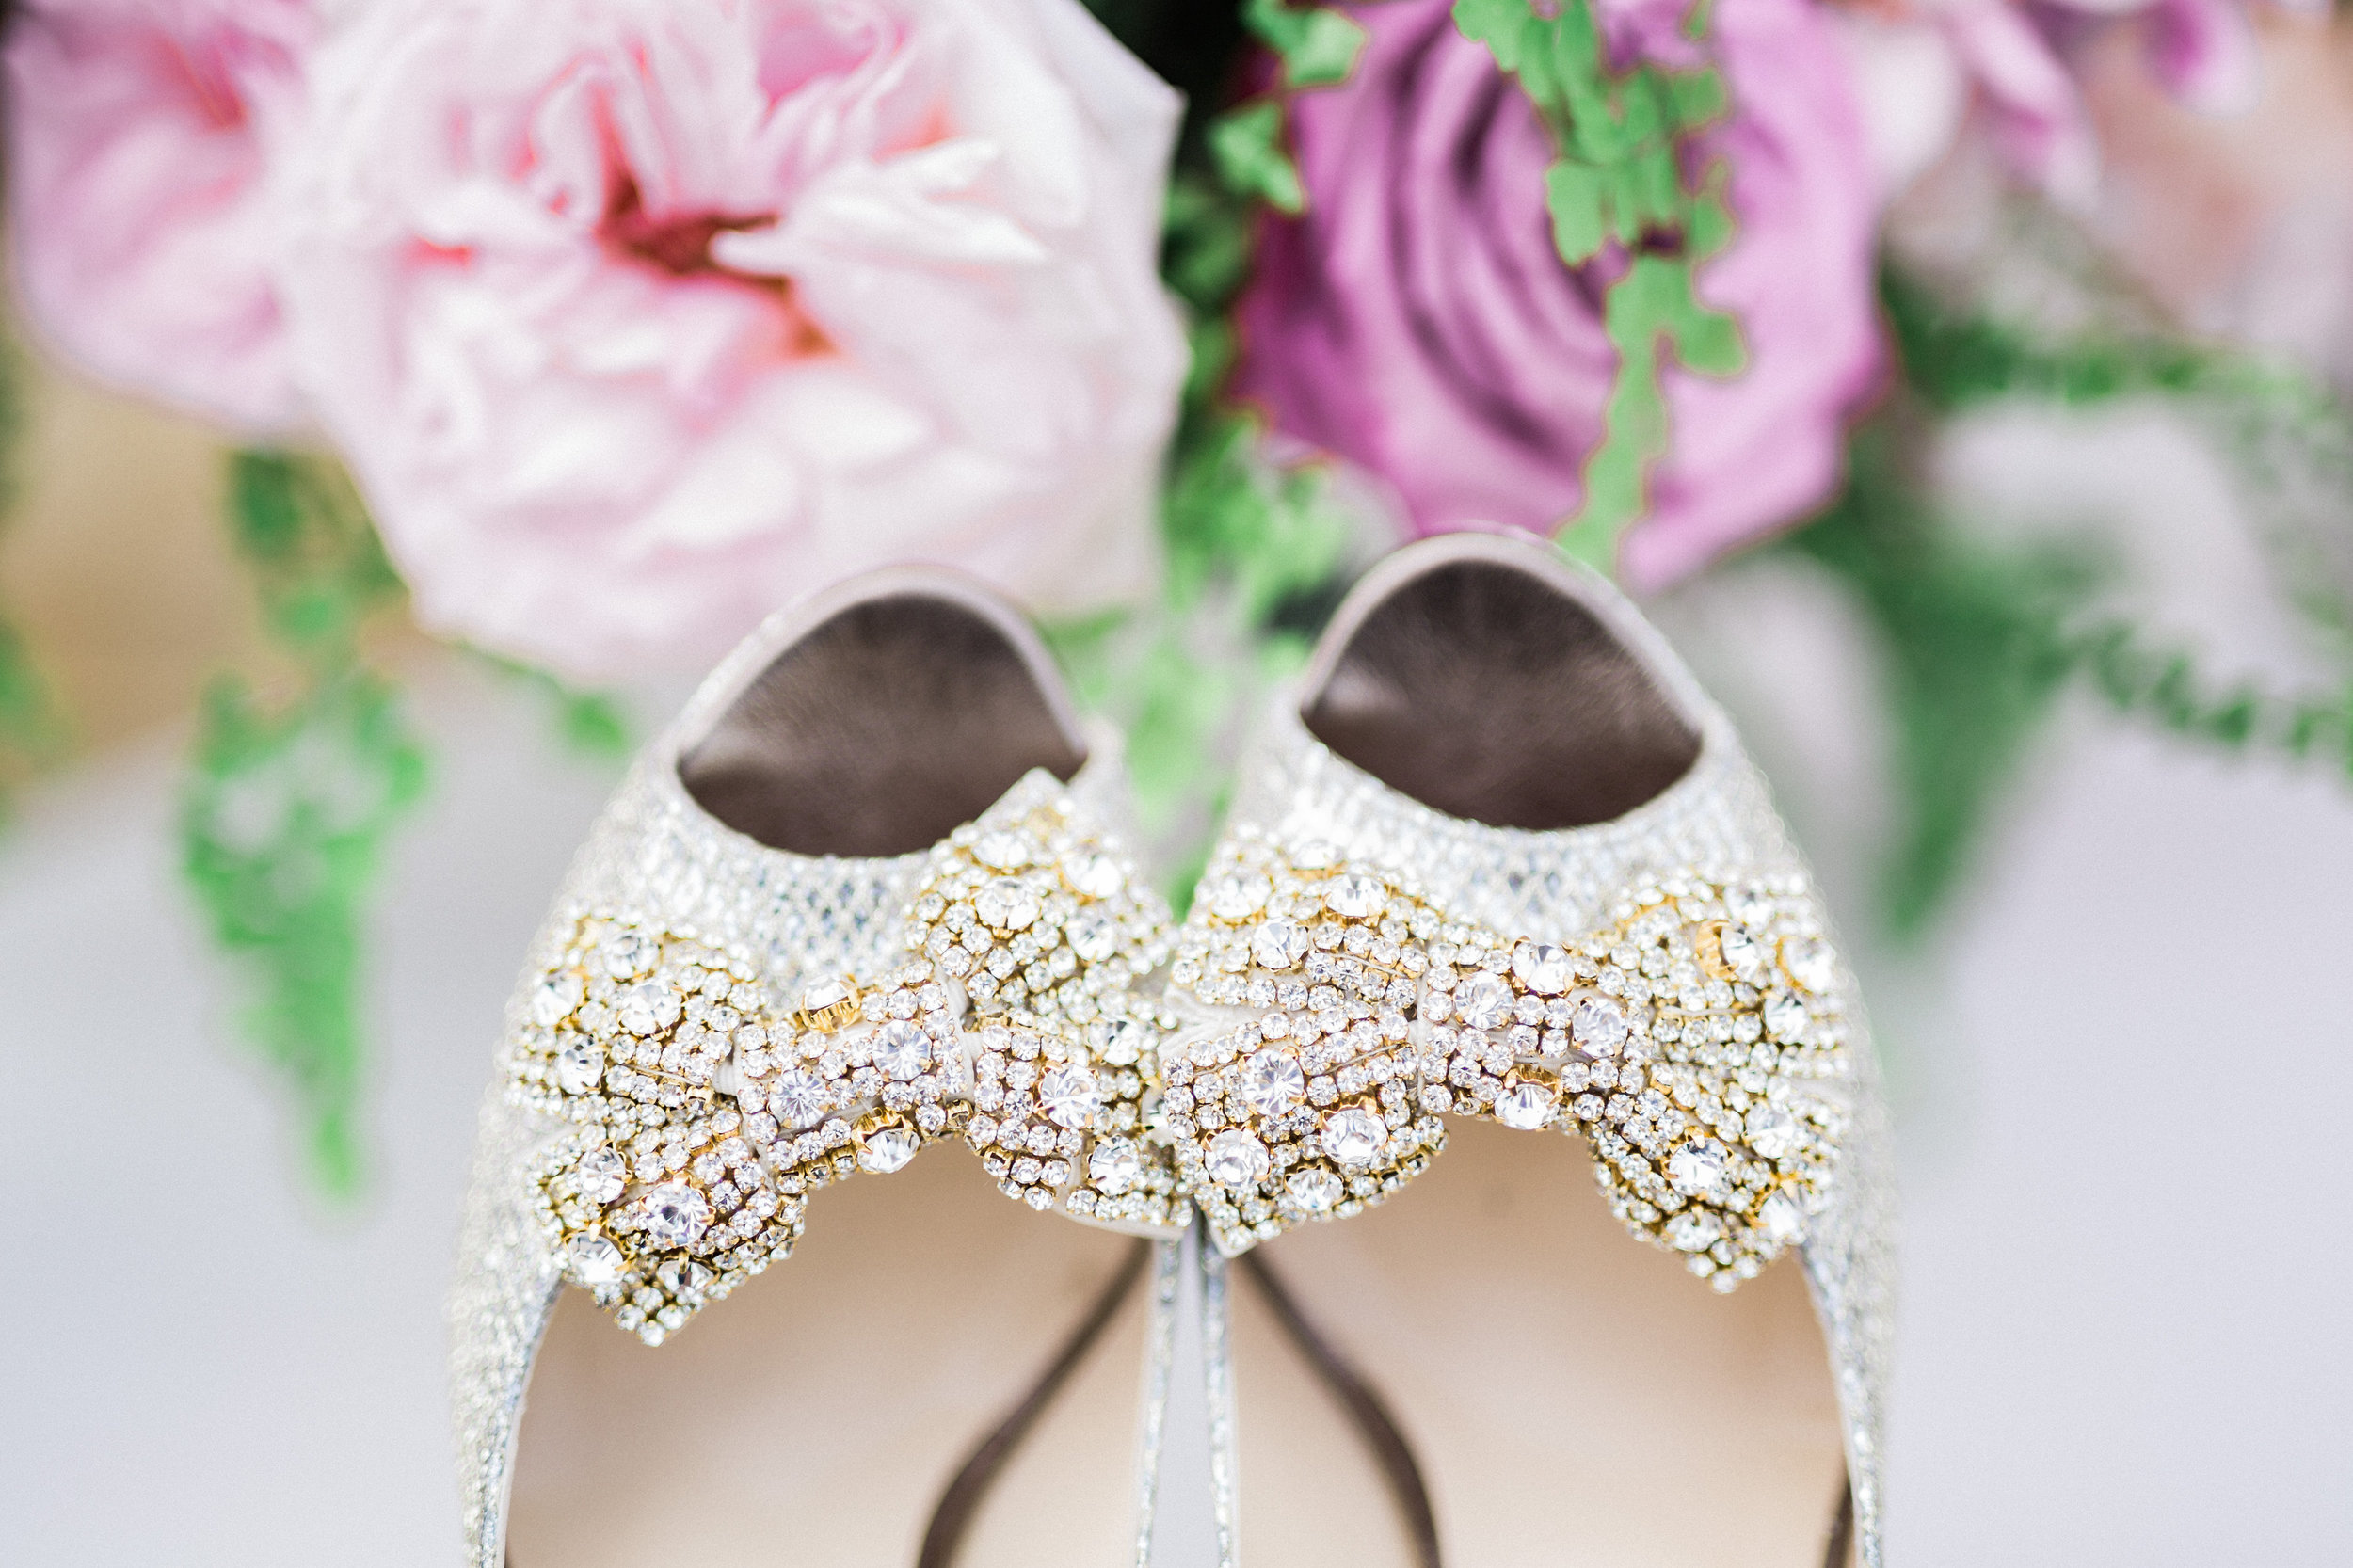 Bridal Shoe Shot at The Hilton Netherland Plaza Hotel Cincinnati, OH